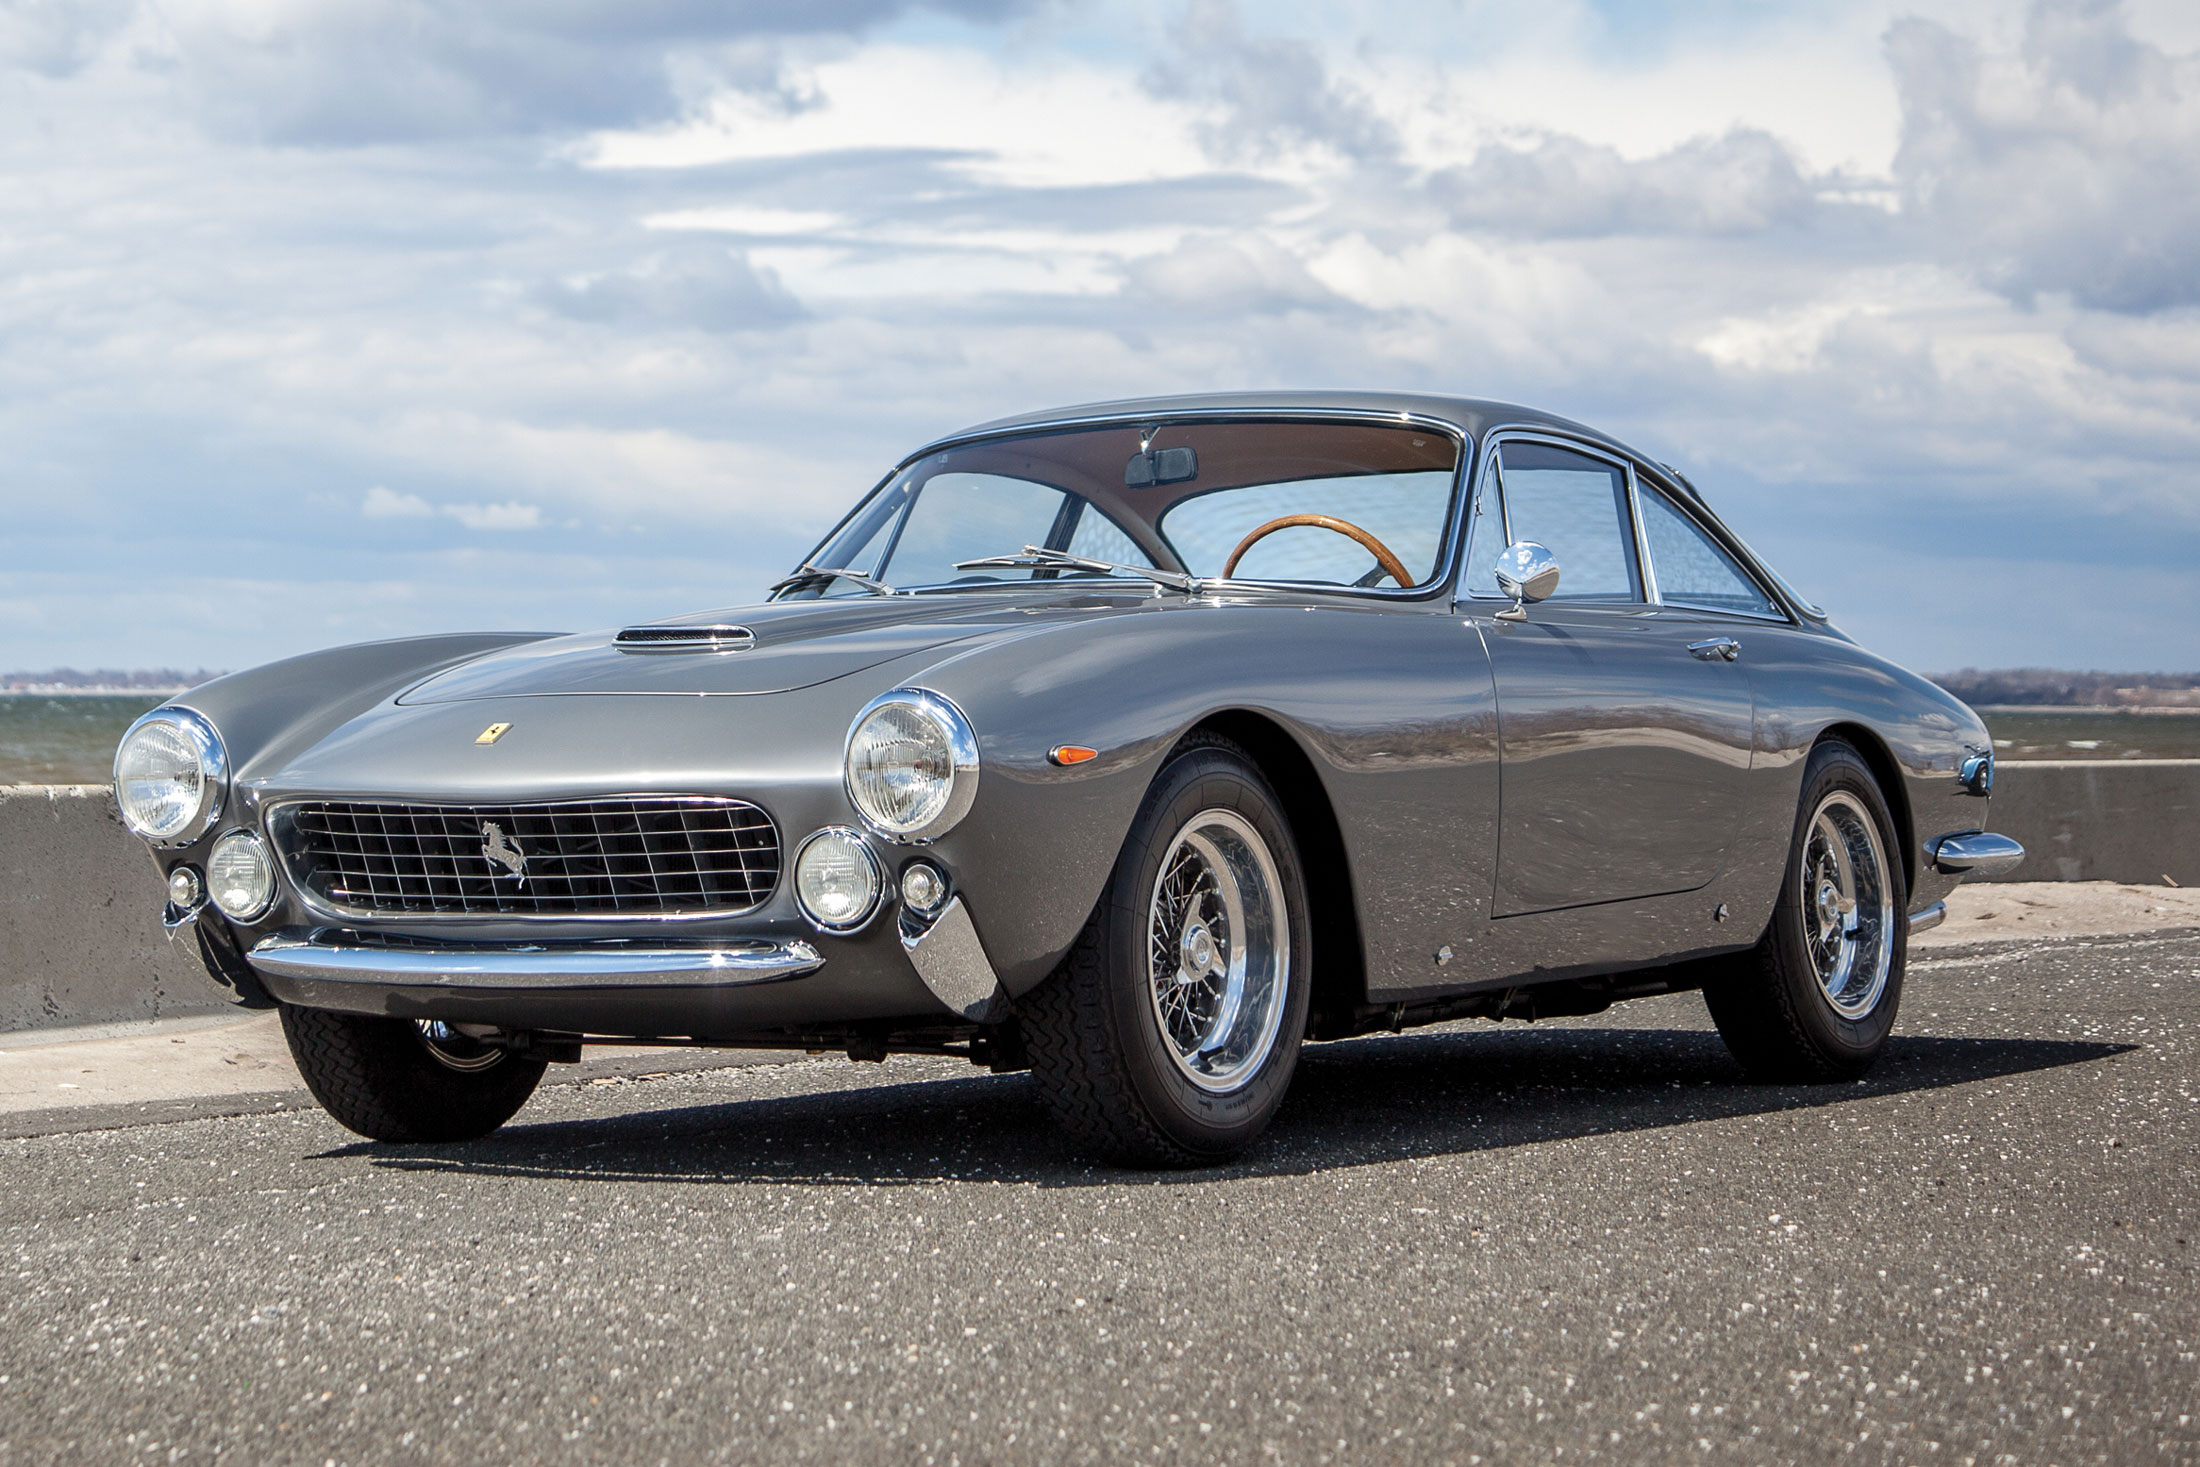 1963 Ferrari 250 GT/L Berlinetta 'Lusso' | RM Sotheby's | Estimate: $2.3 million